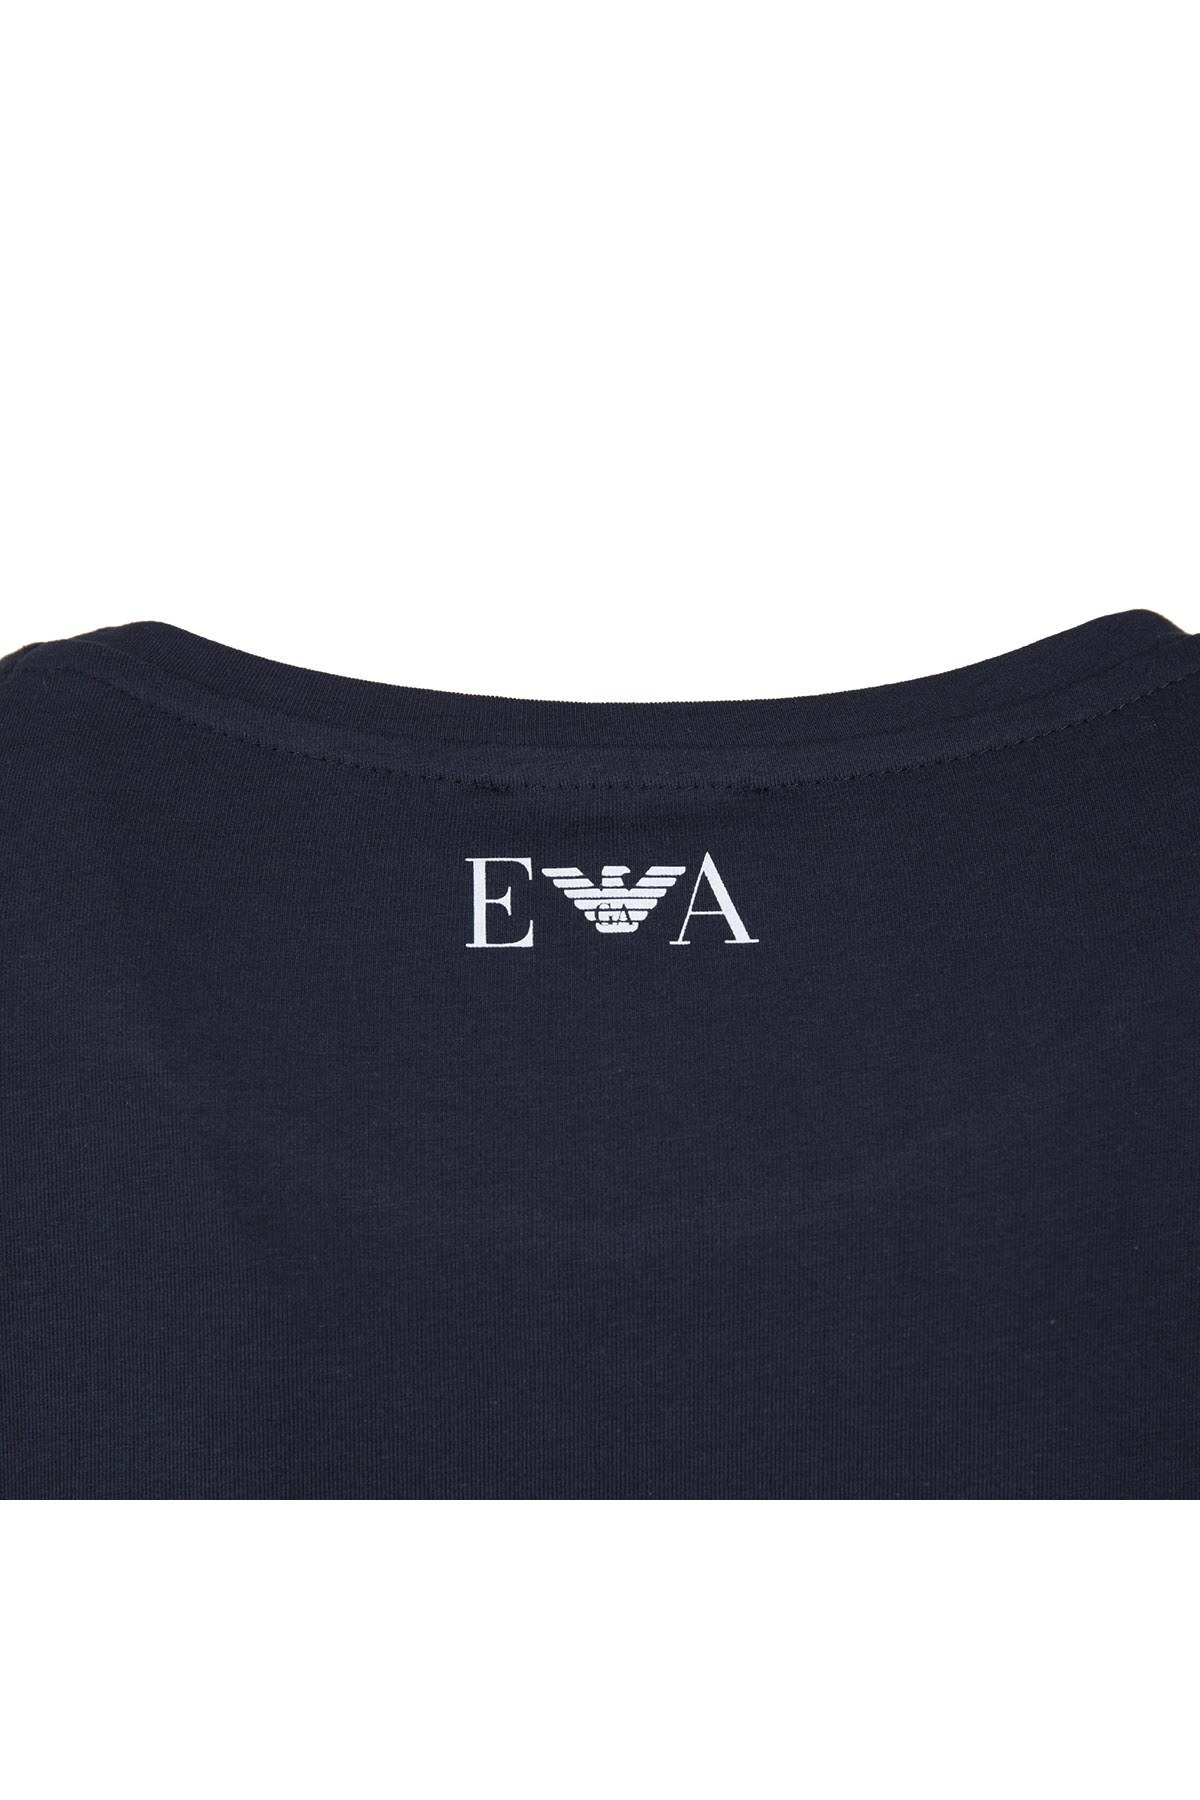 EMPORIO ARMANI T SHIRT Kadın T Shirt 3Z2T65 2J07Z LACİVERT